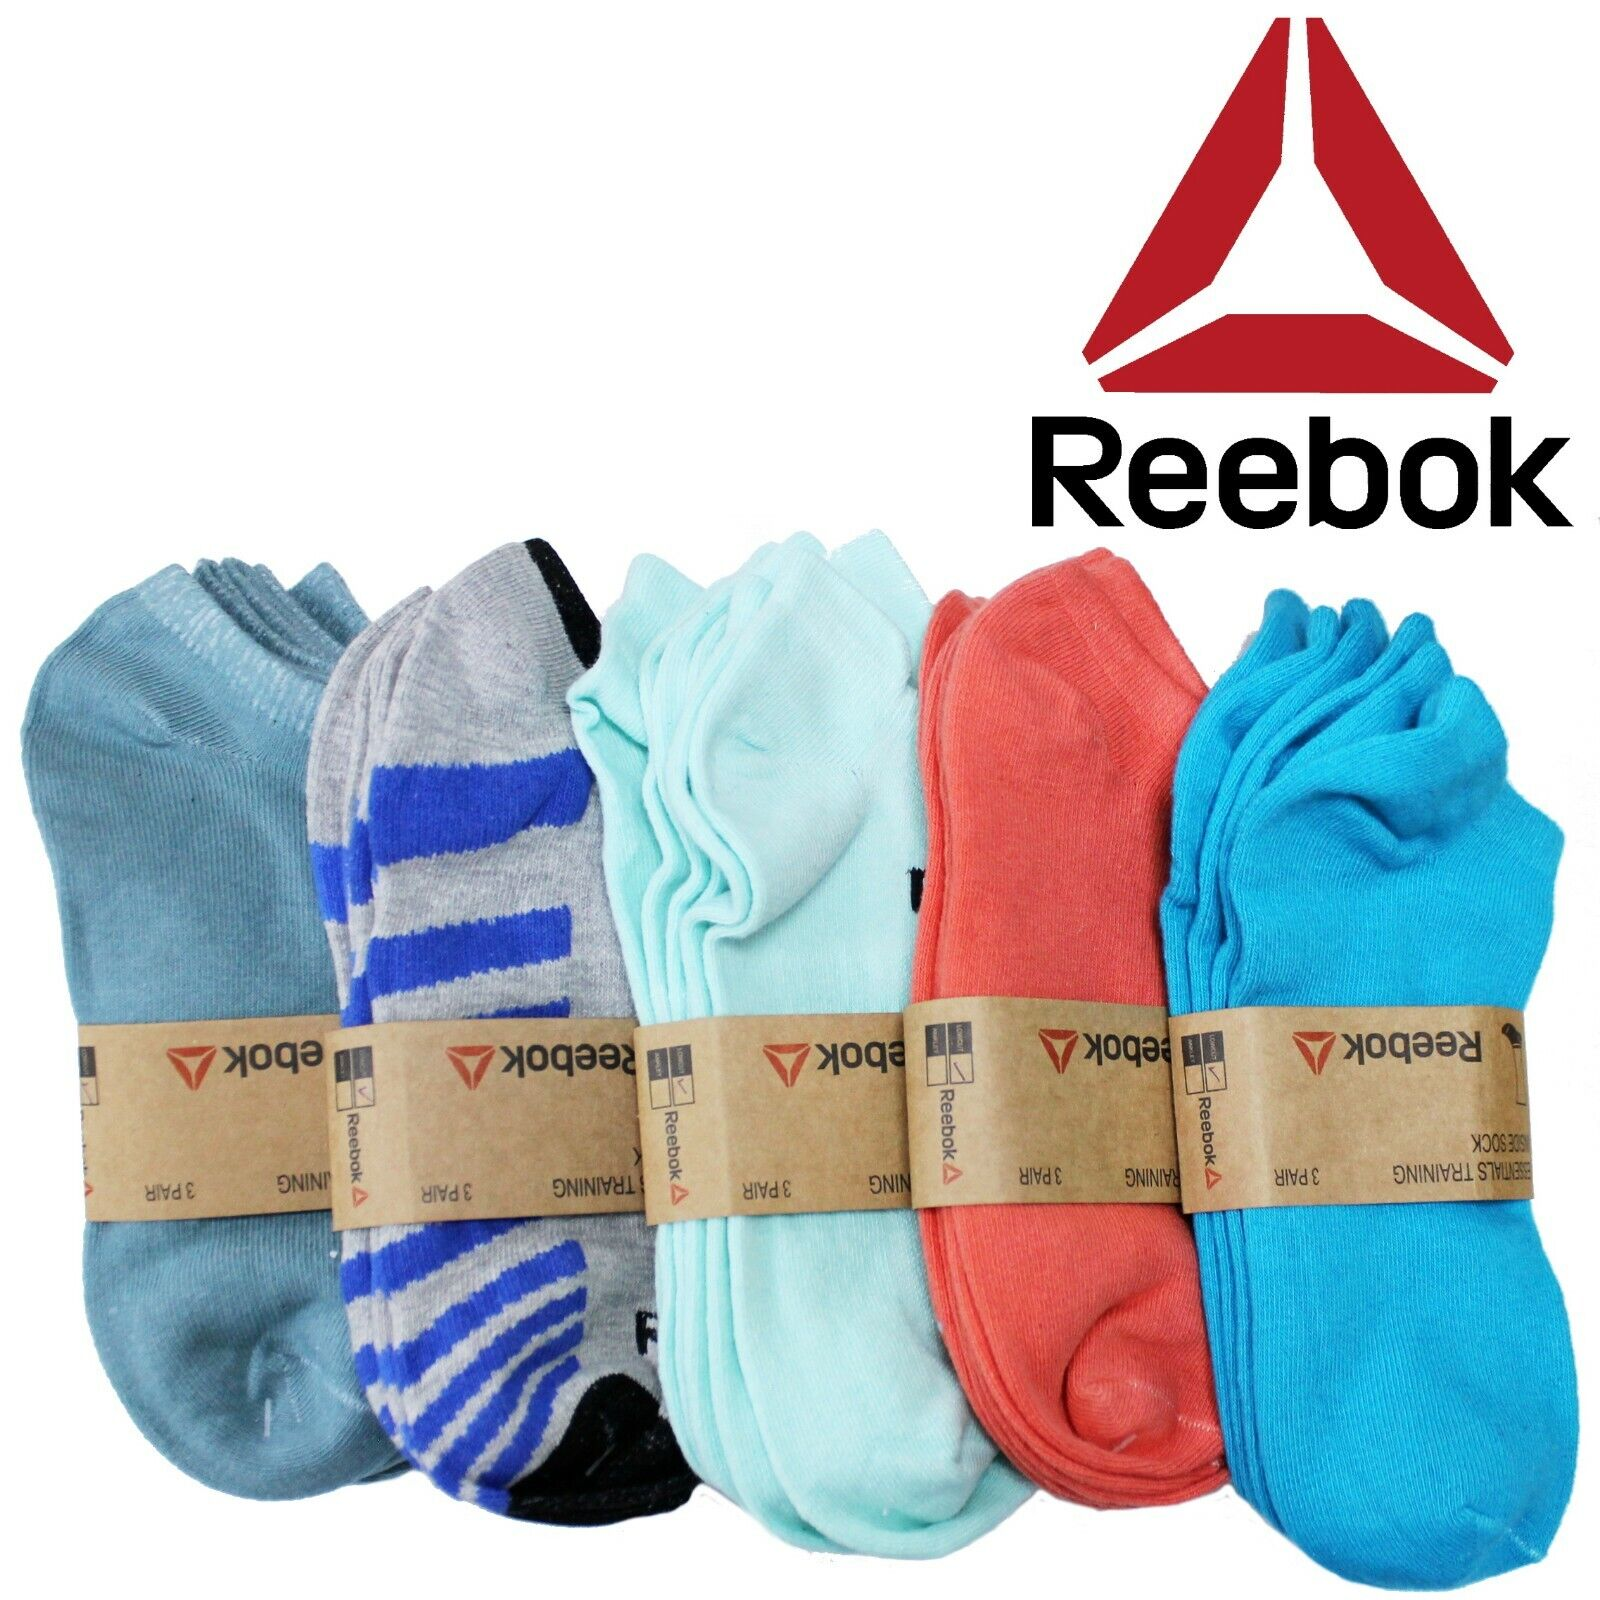 Horizon Sports Trainer Socks 3 Pair Pack